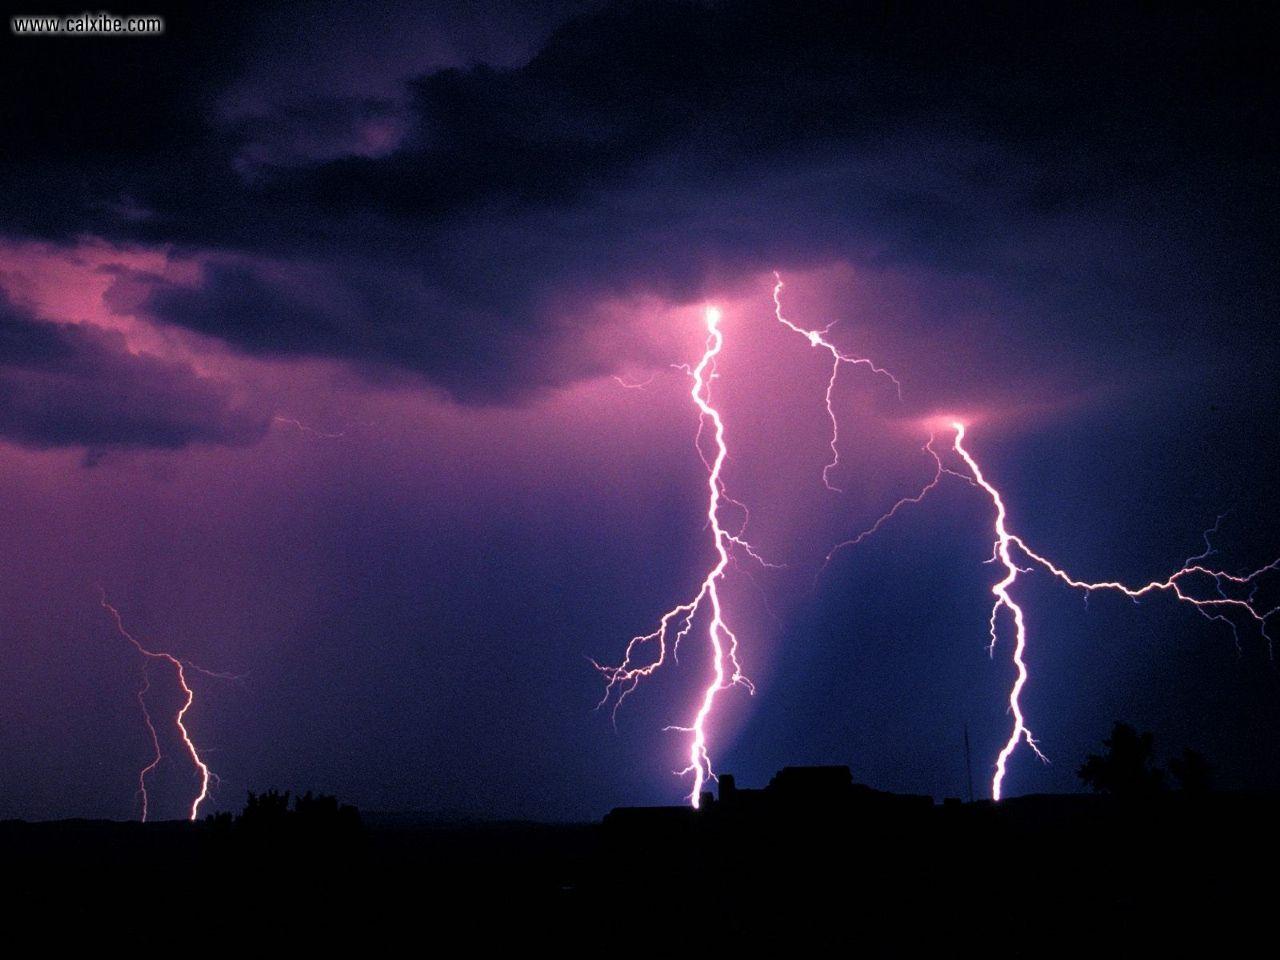 1280x960 Nature Lightning Storm Petrified Forest National Park Arizona